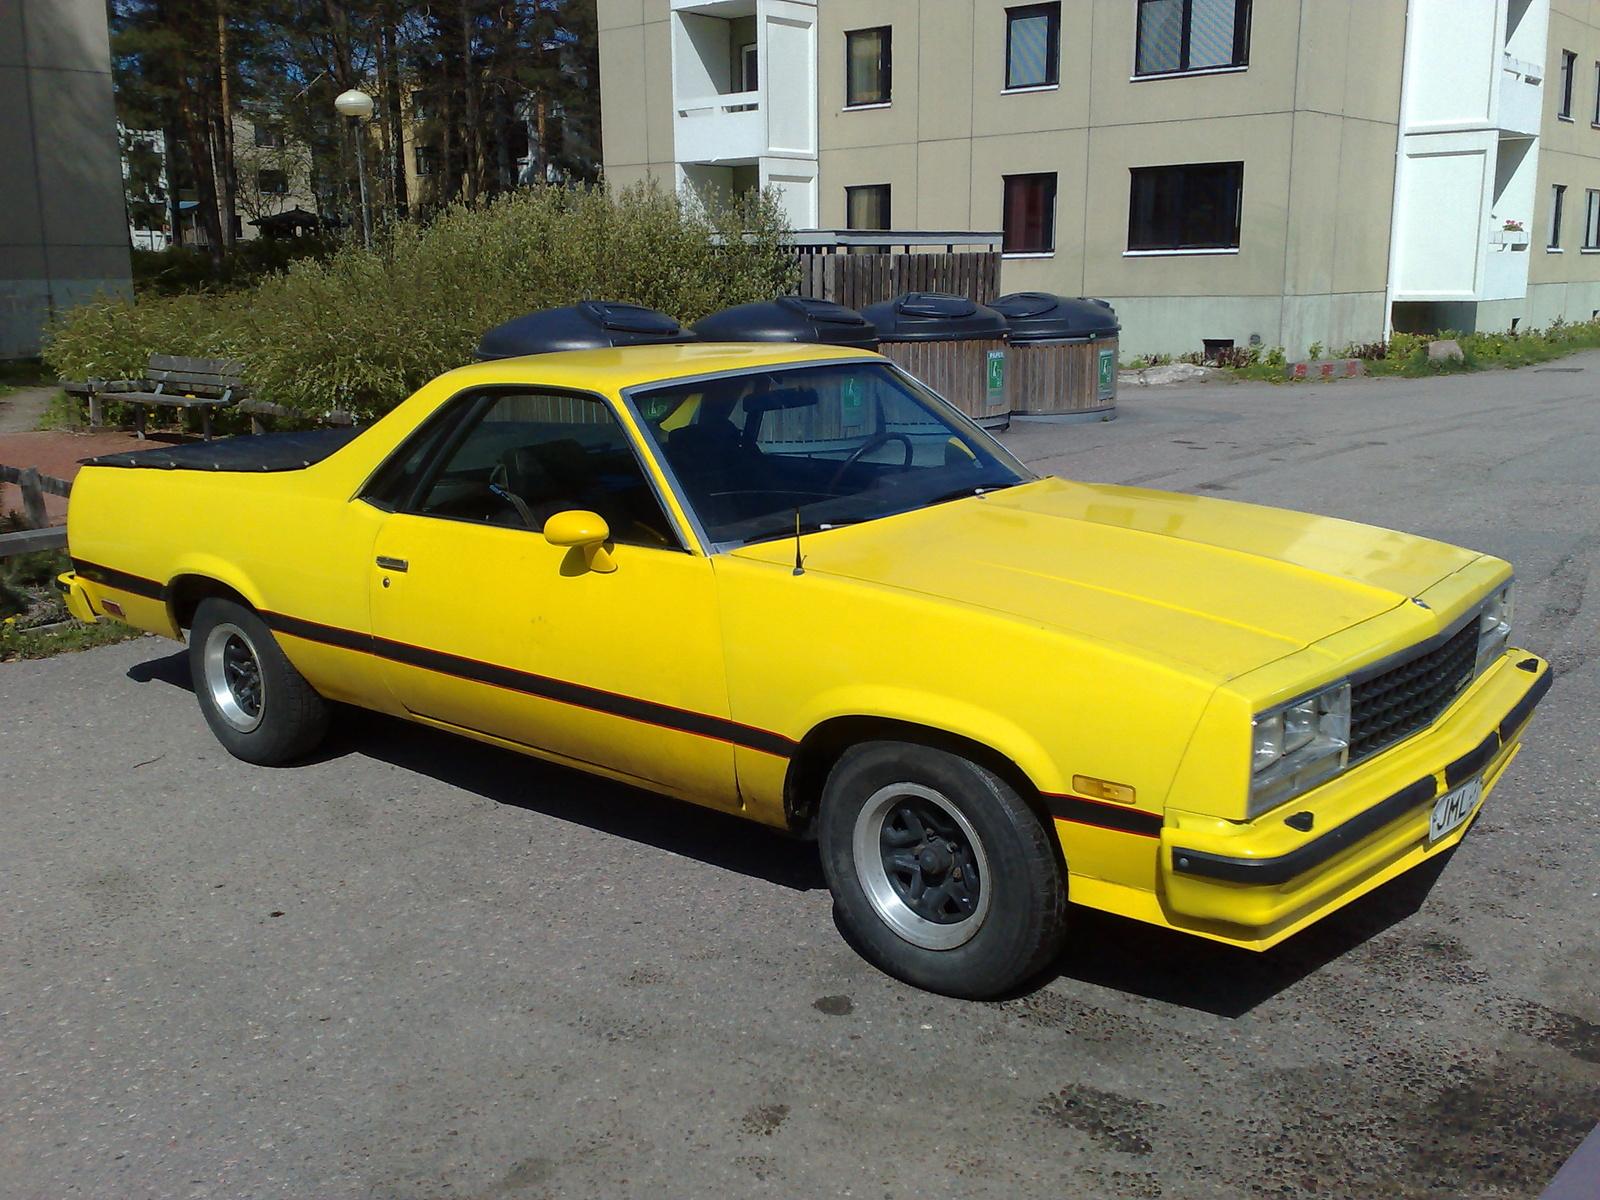 1983 Chevrolet El Camino picture, exterior